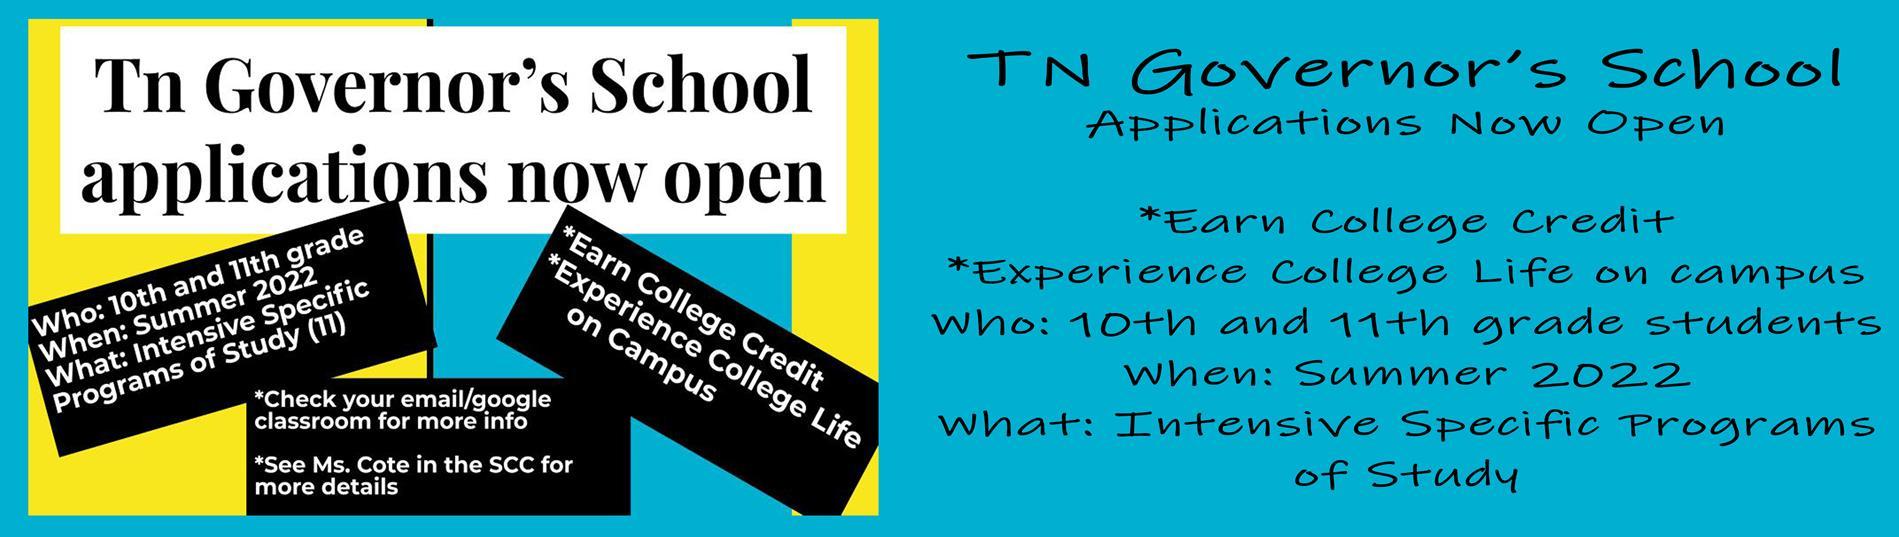 TN Governor's School